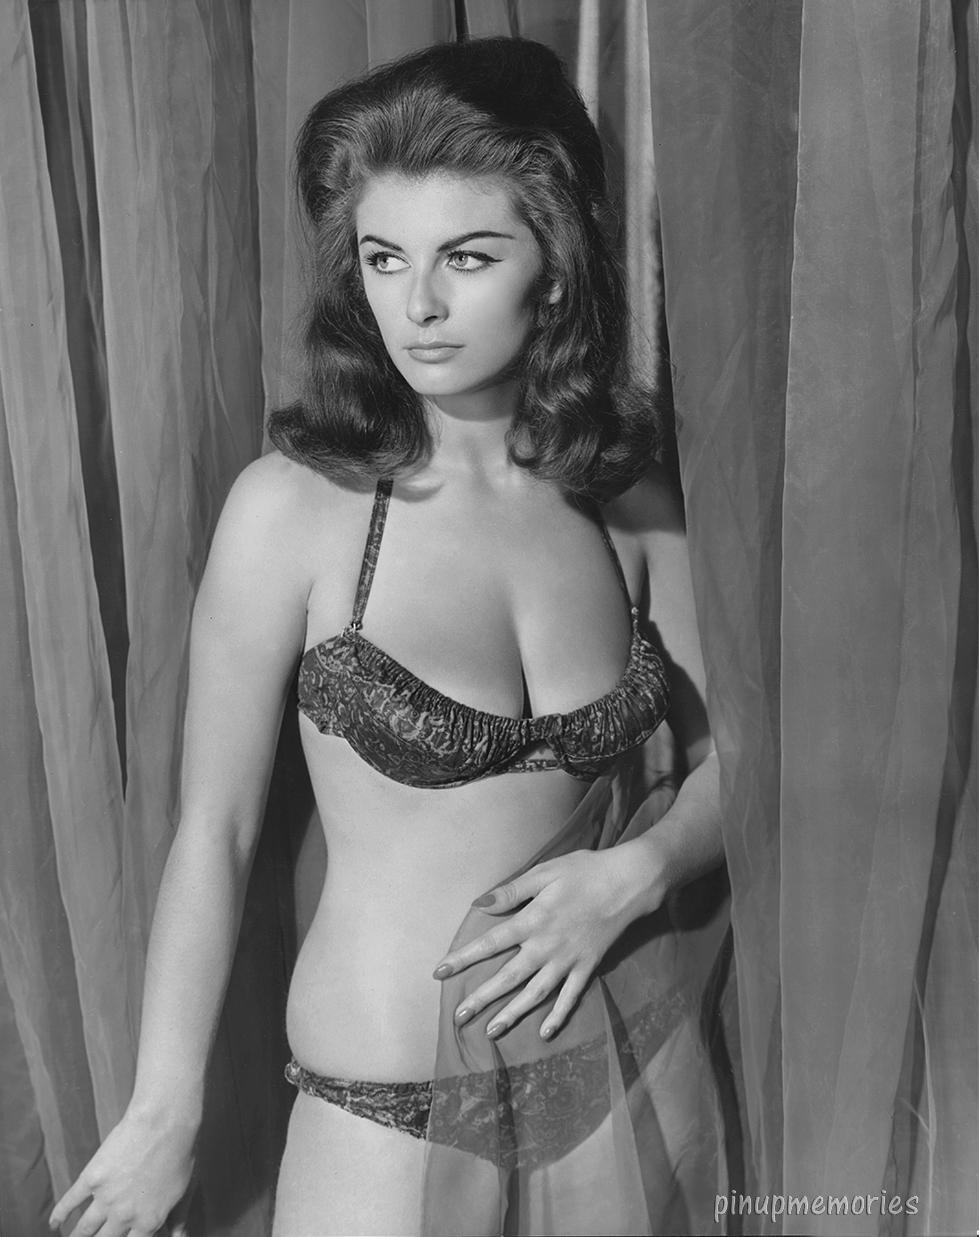 Anne Eden - Model page